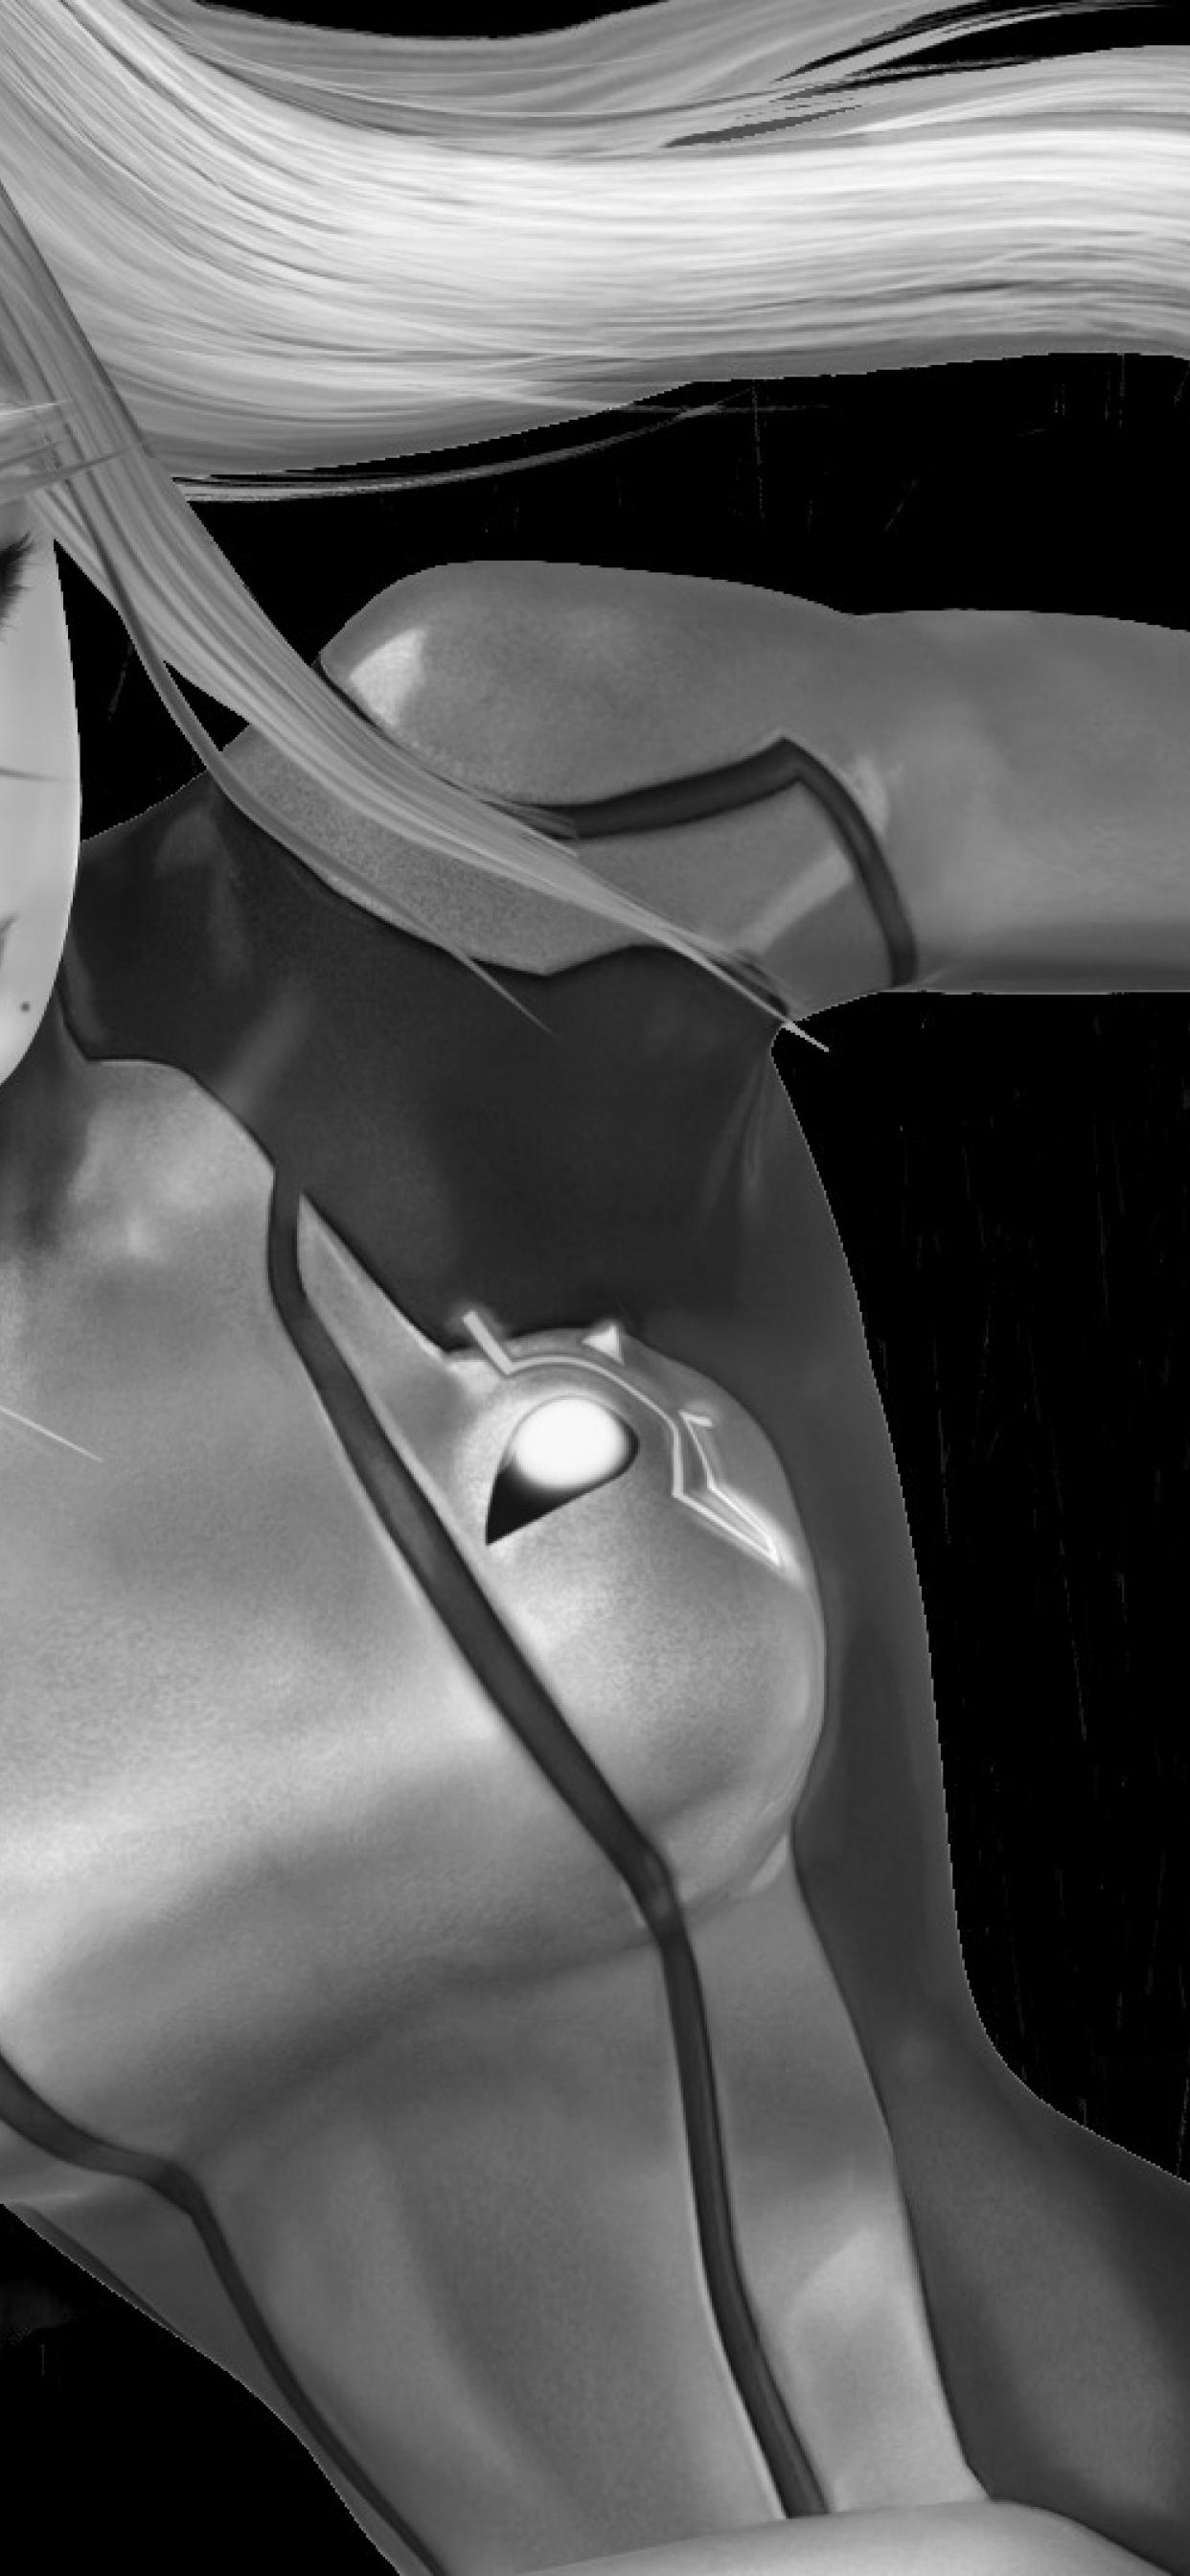 1242x2688 Metroid Samus Aran Zero Suit Iphone Xs Max Wallpaper Hd